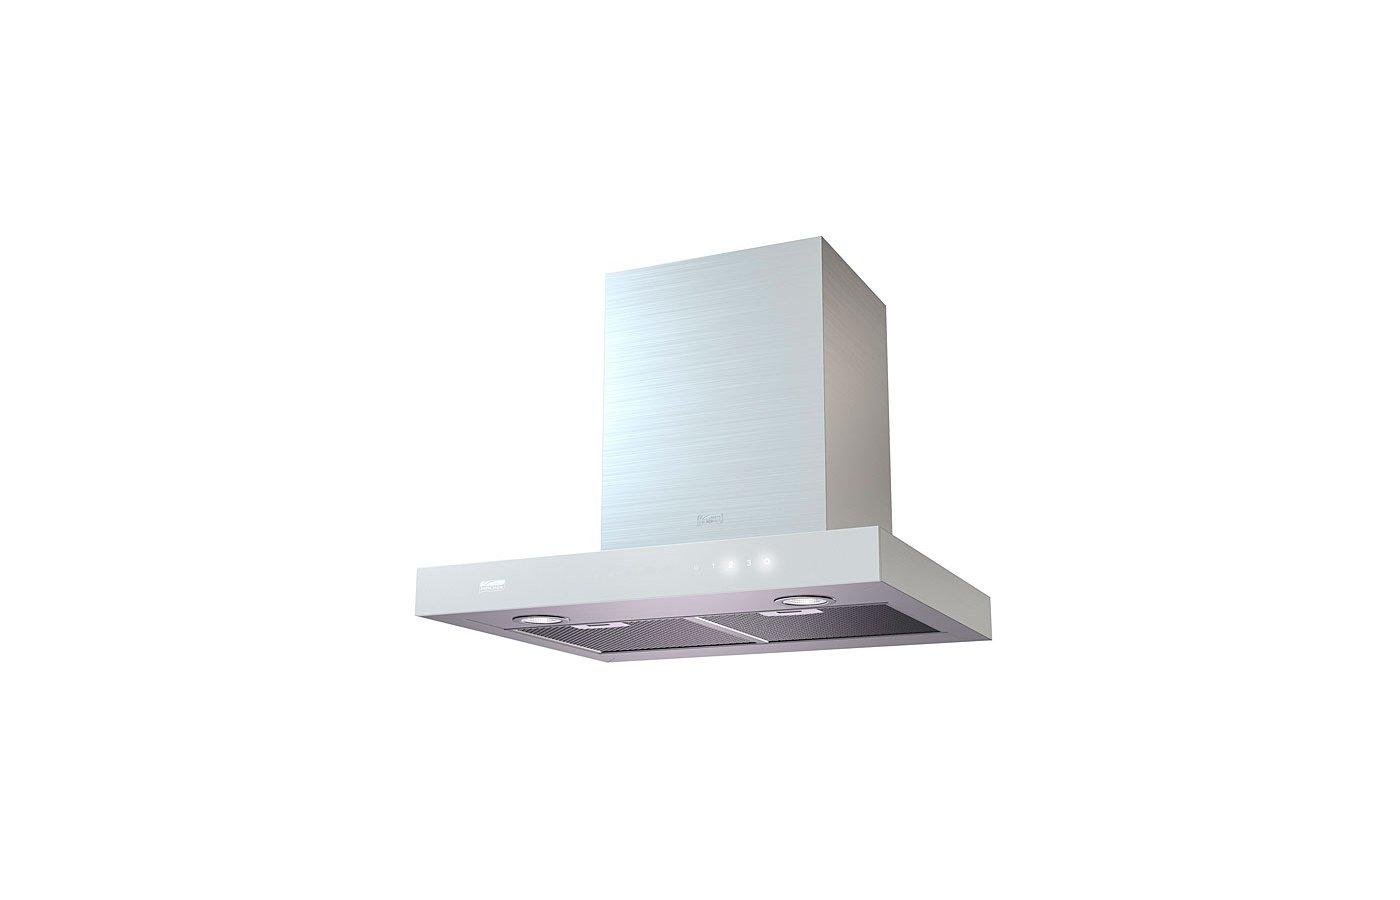 Вытяжка KRONA PAOLA 600 inox/white sensor